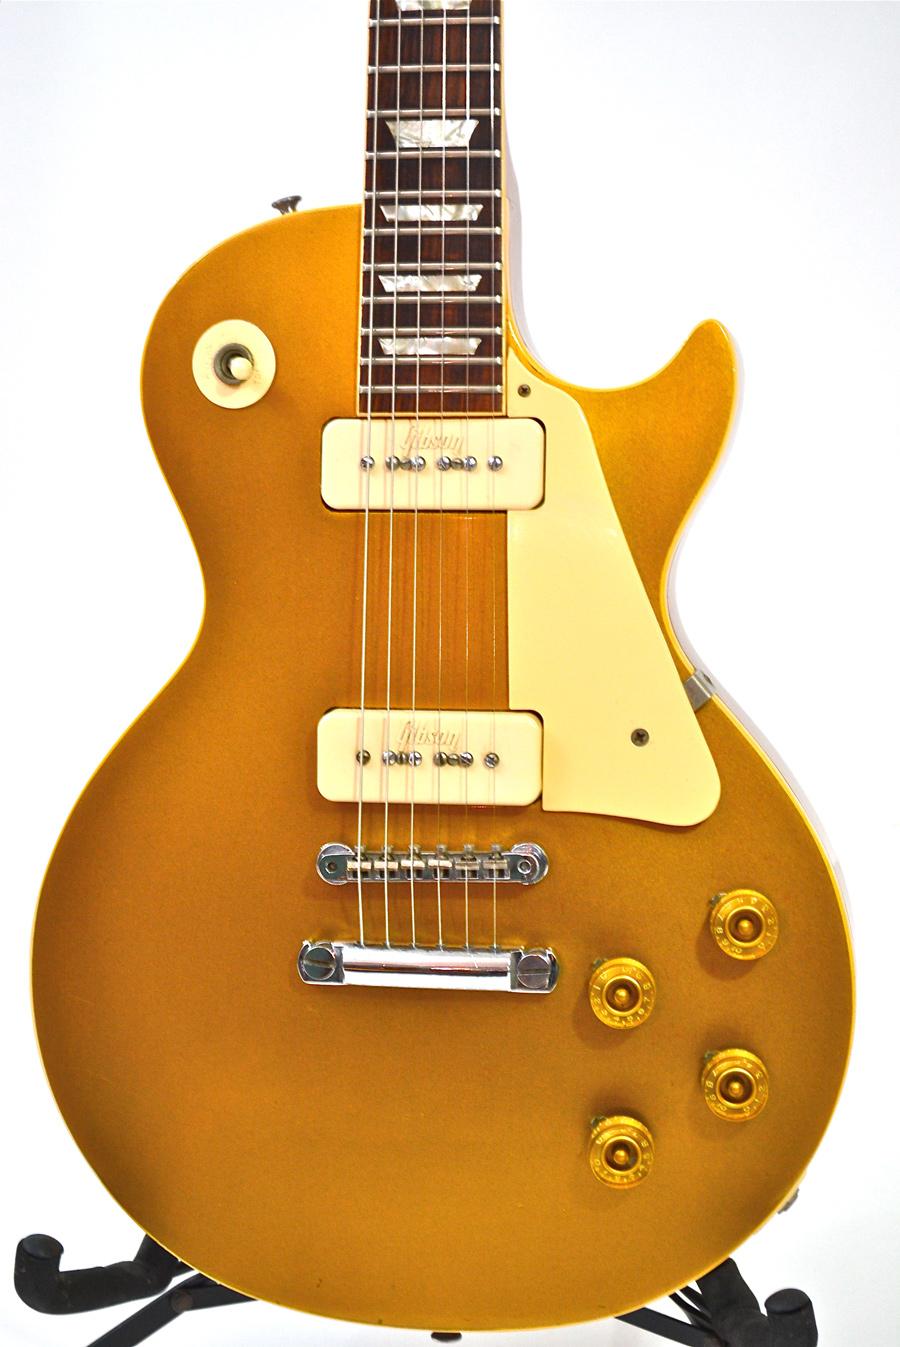 1971 gibson 58 39 les paul reissue voltage guitar. Black Bedroom Furniture Sets. Home Design Ideas